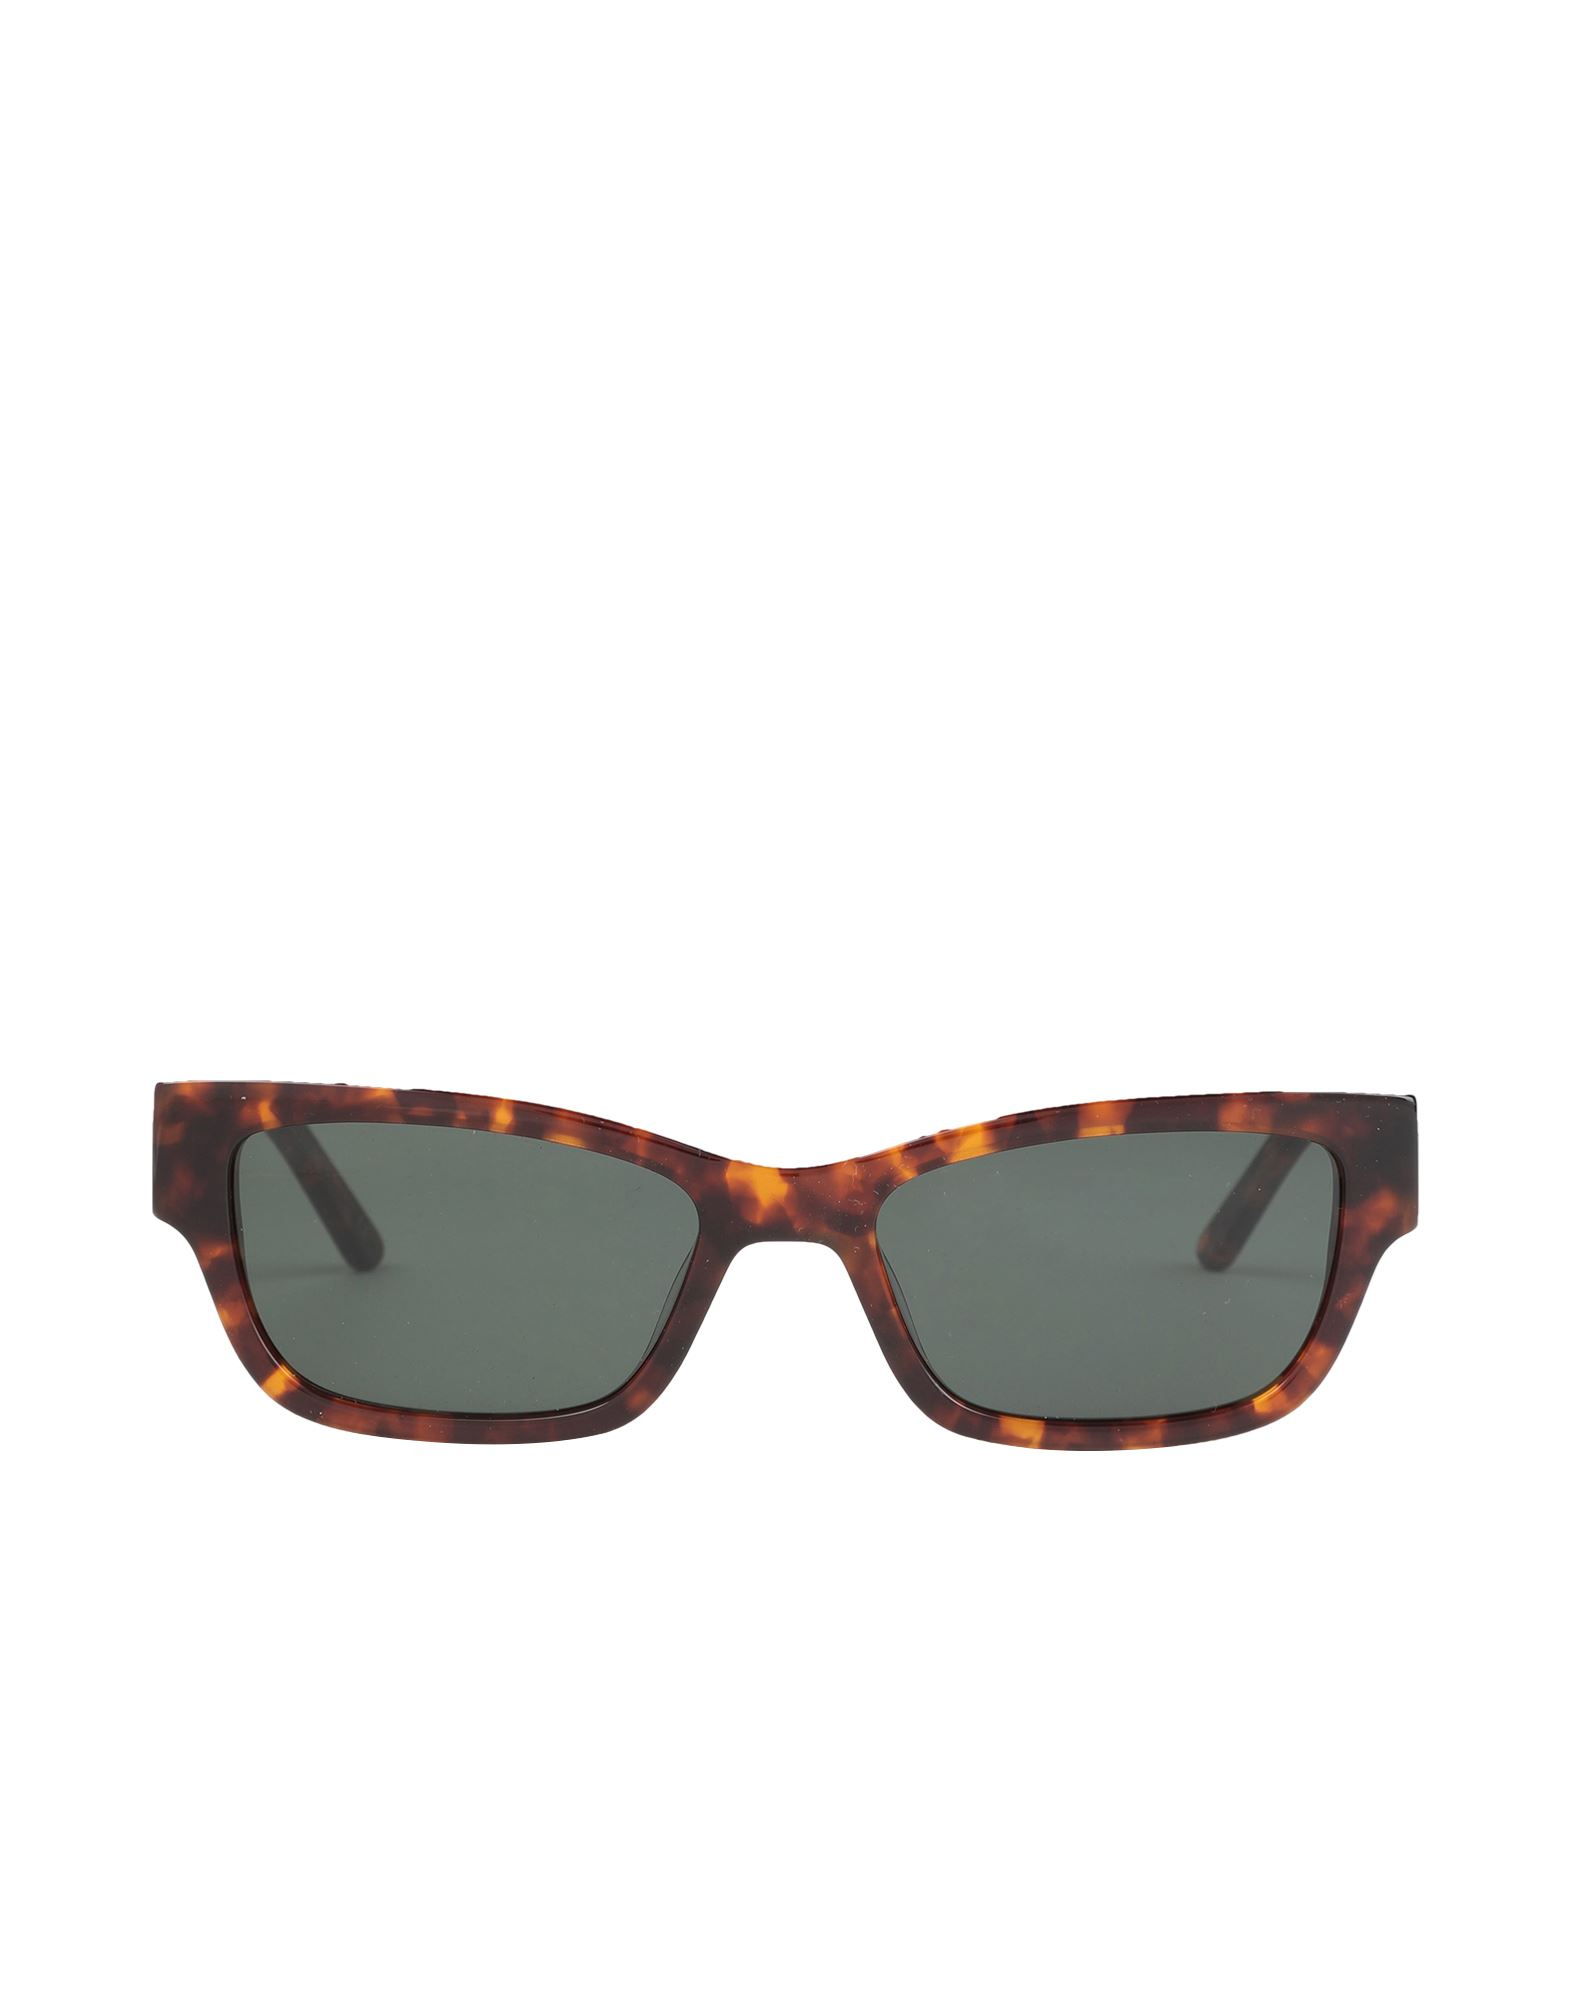 HAN KJØBENHAVN Sunglasses - Item 46737556